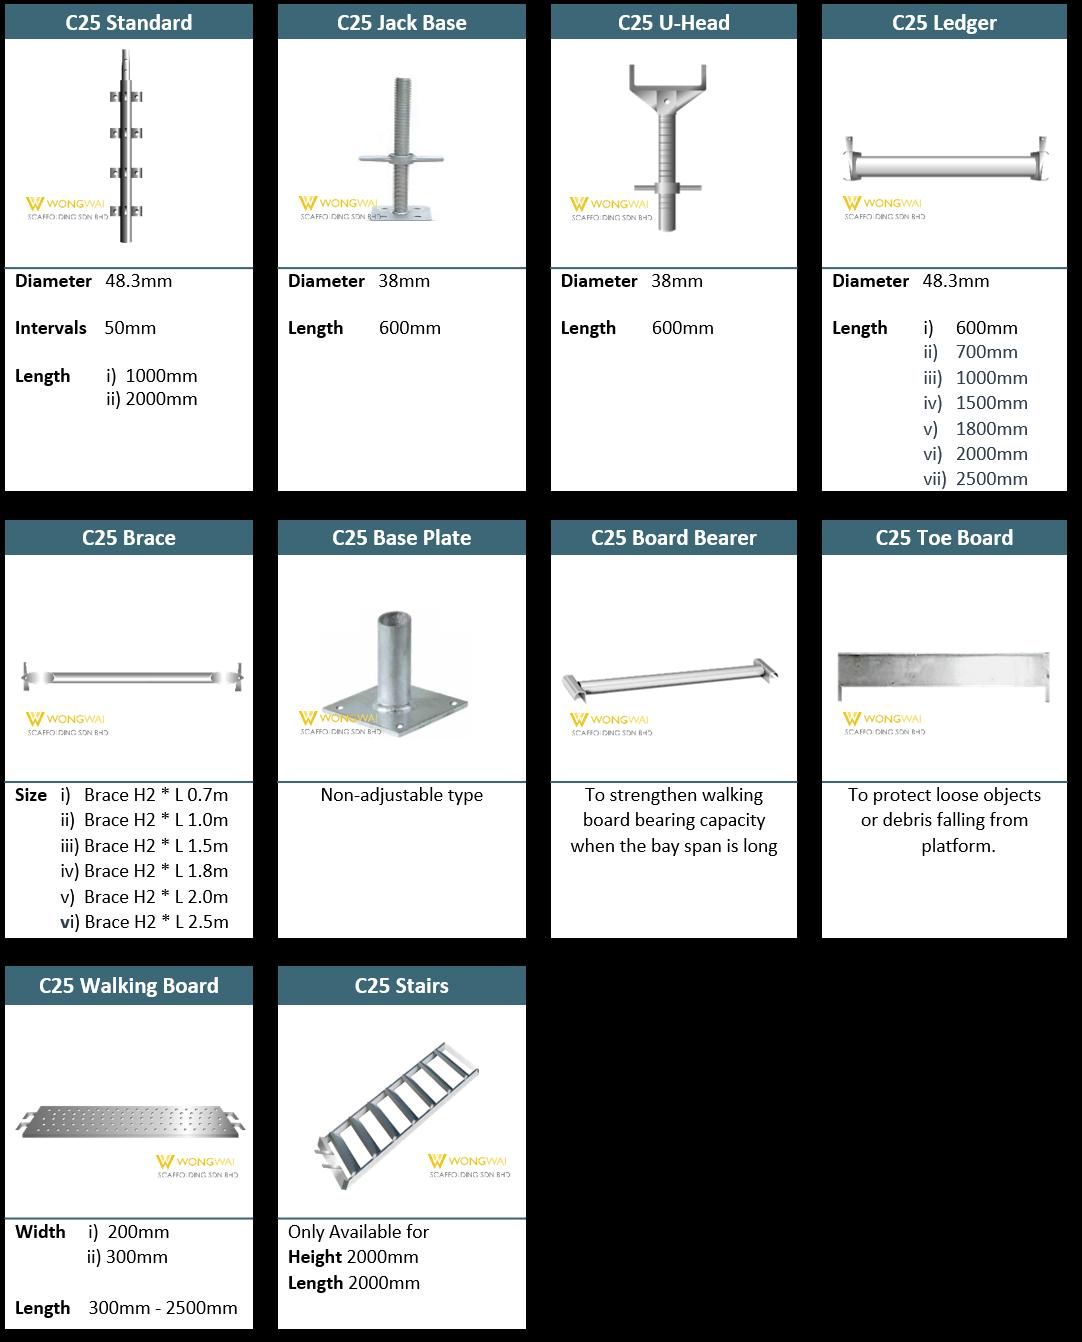 C25 Scaffolding | All in One Scaffolding Service | Wong Wai